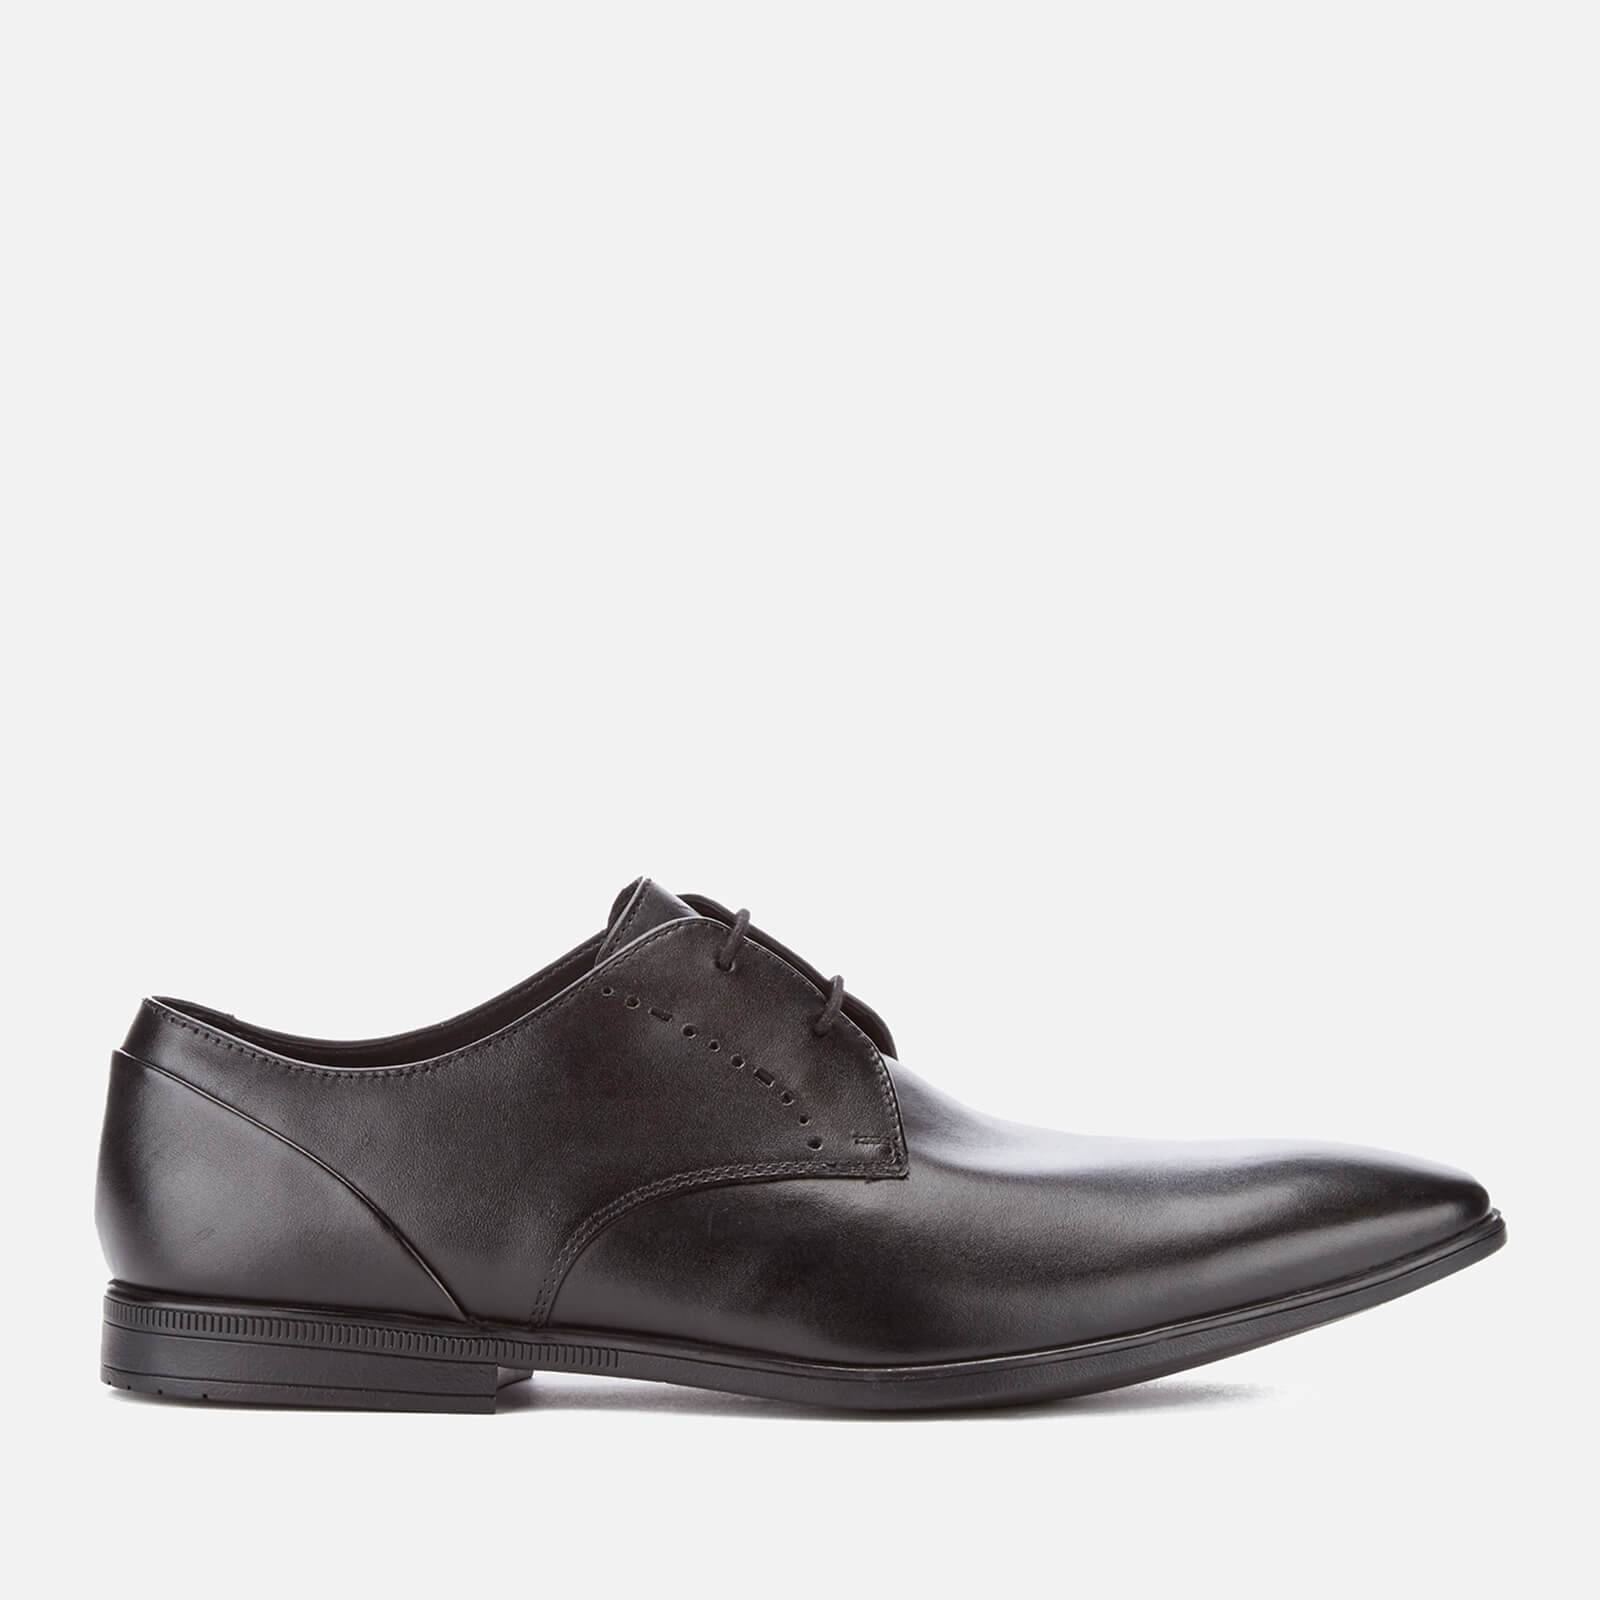 Clarks Men's Bampton Lace Leather Derby Shoes - Black - UK 9